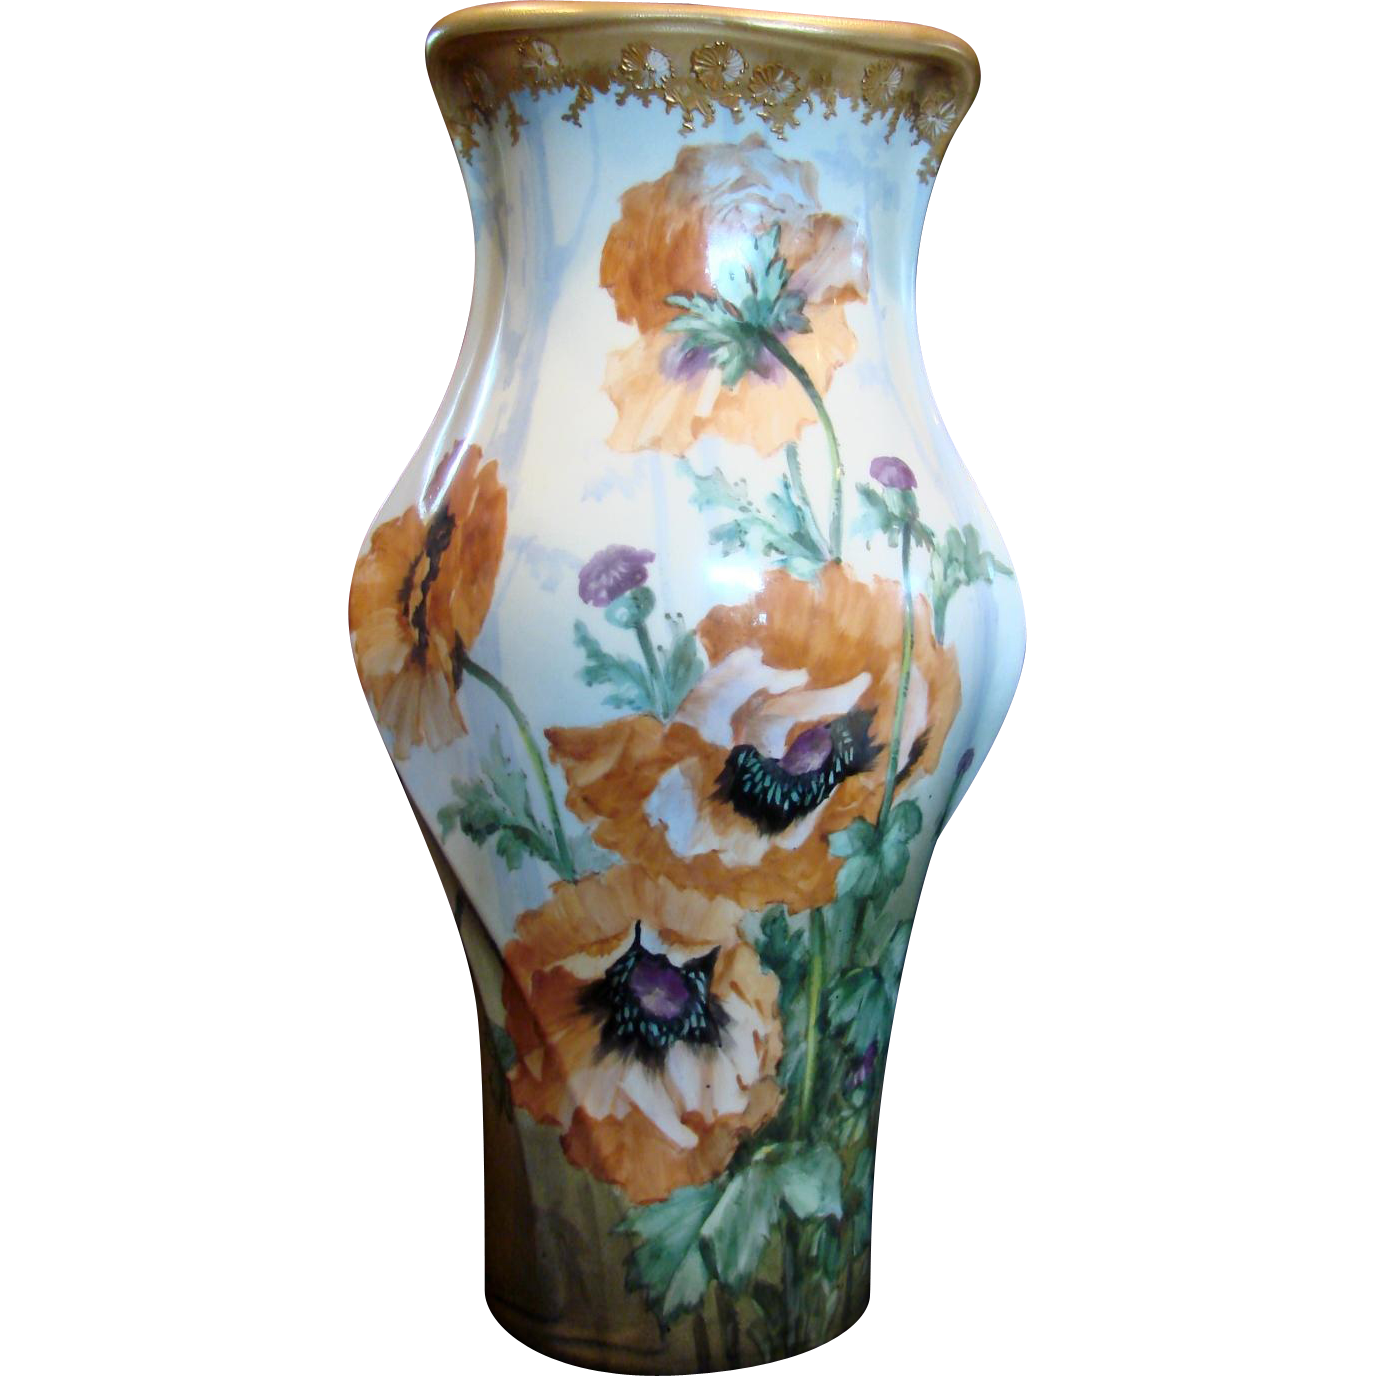 "Bohemian Czech Turn-Teplitz Marked Amphora 14 ½"" Hand Painted Vase Huge Poppies Gold Detail c 1892 - 1905"